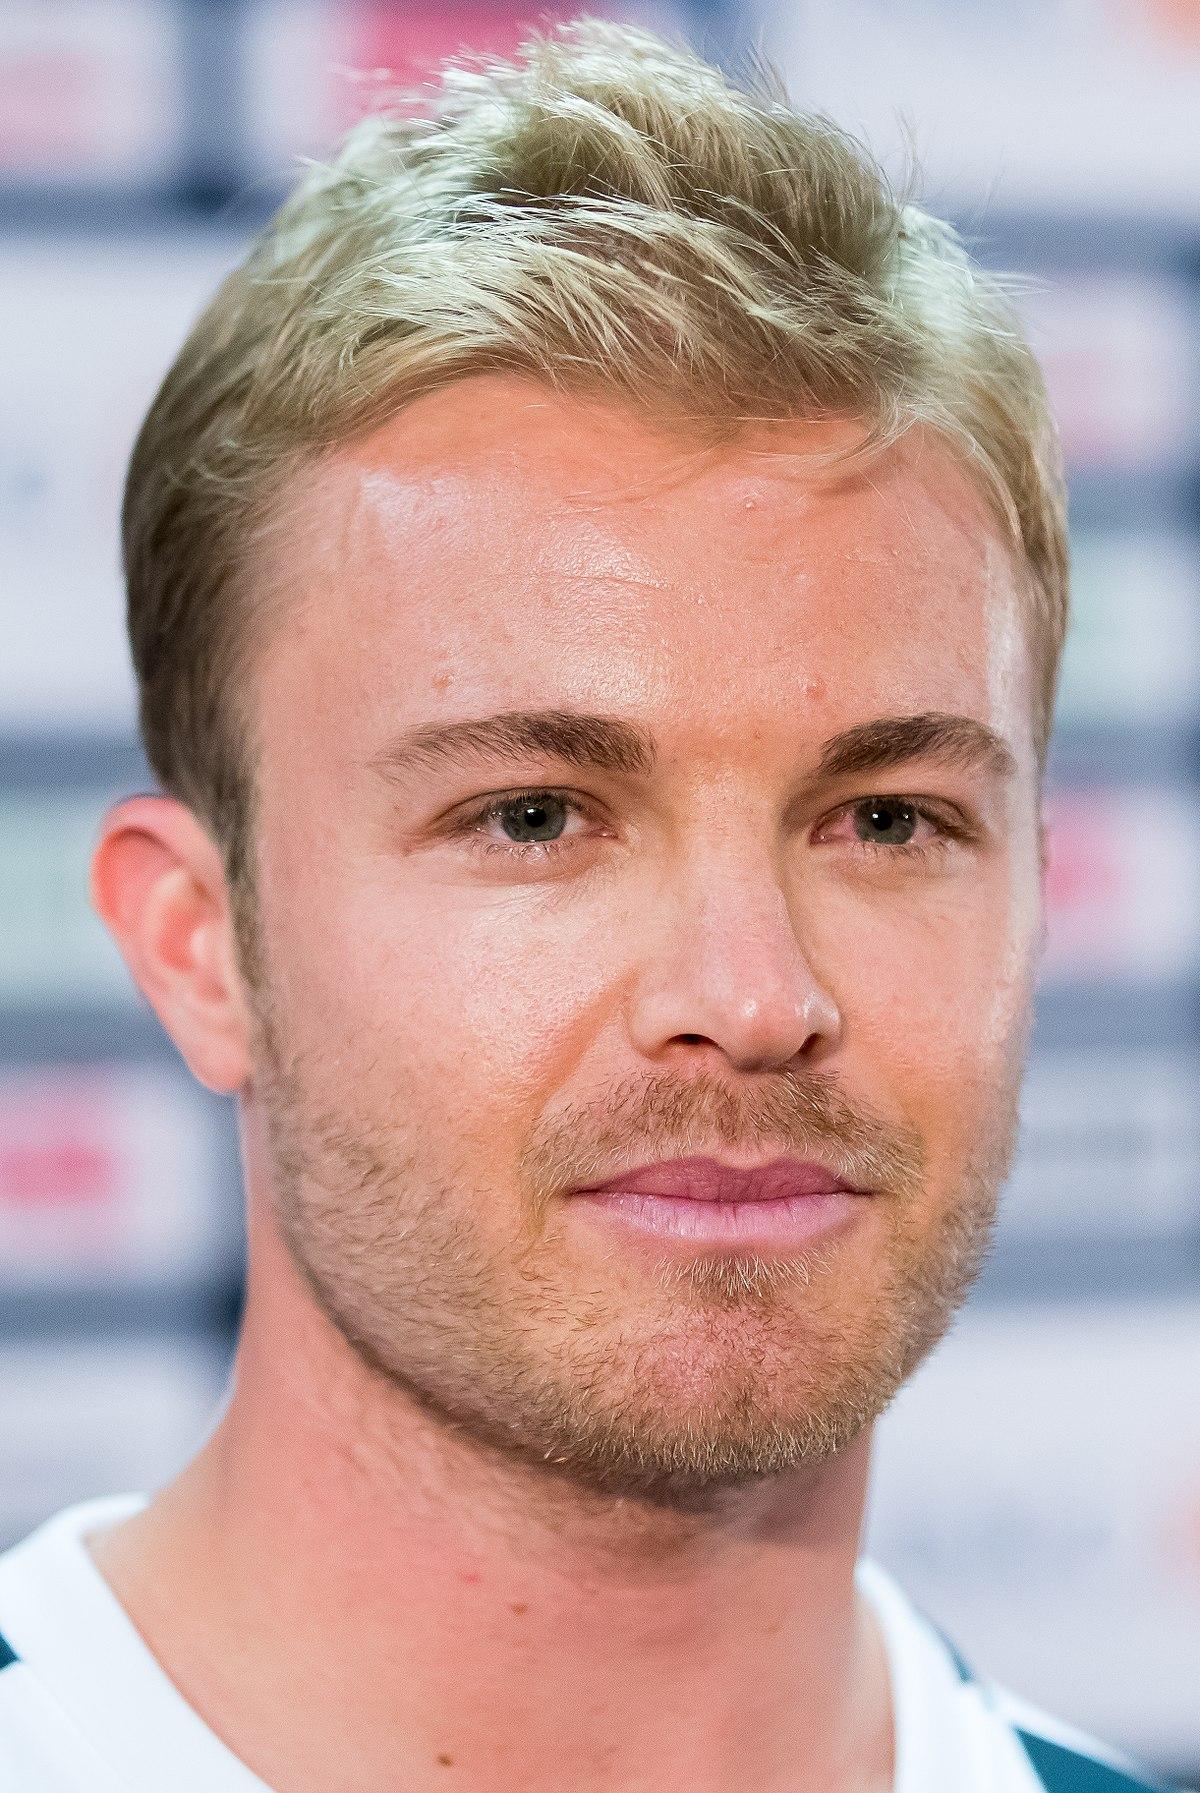 Nico.Rosberg